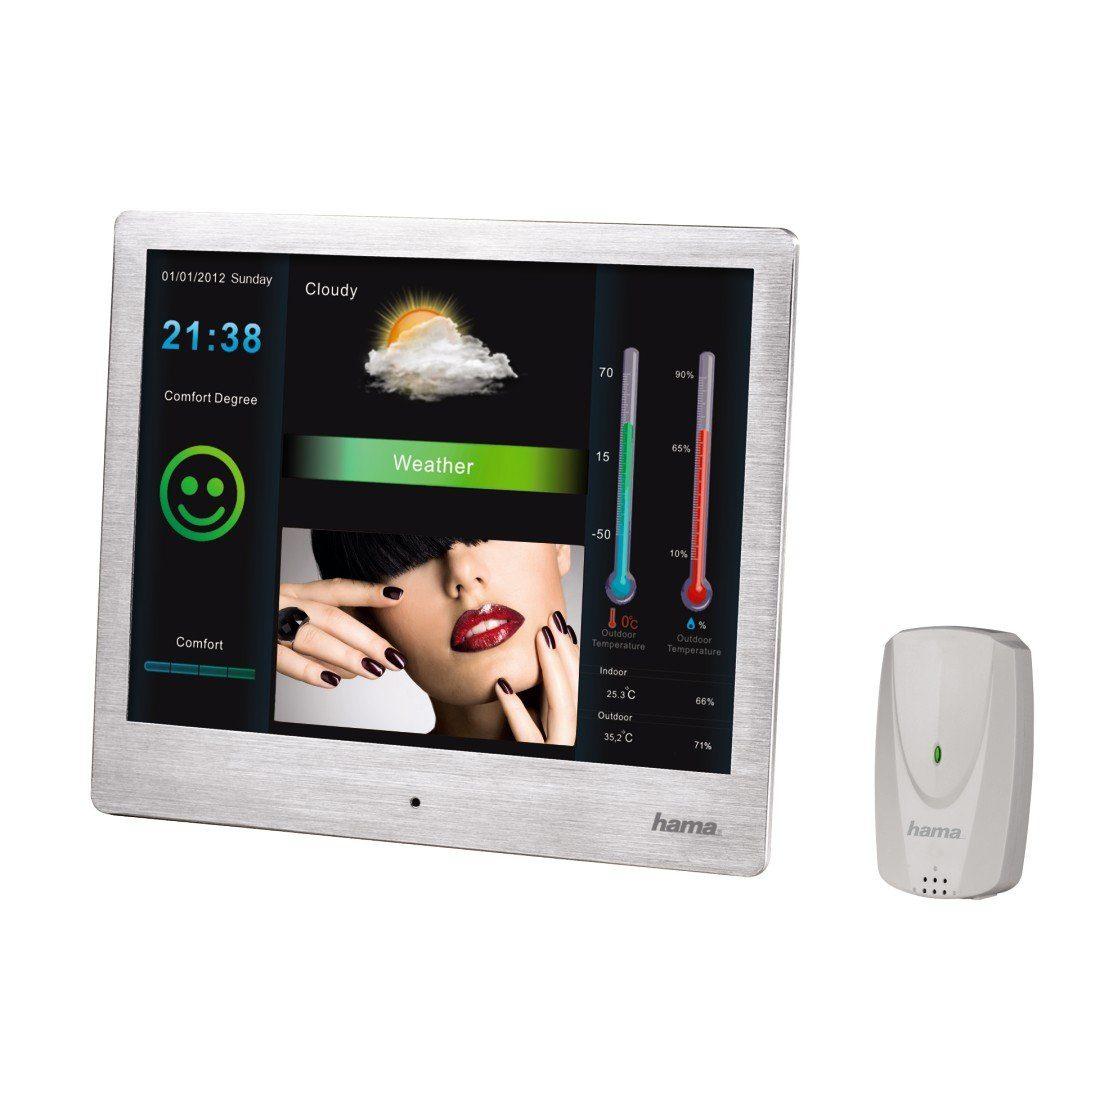 Hama Digitaler Bilderrahmen, Wetterstation 26,64 cm (9,7 Zoll) »USB SD SDHC MMC Fernbedienung«